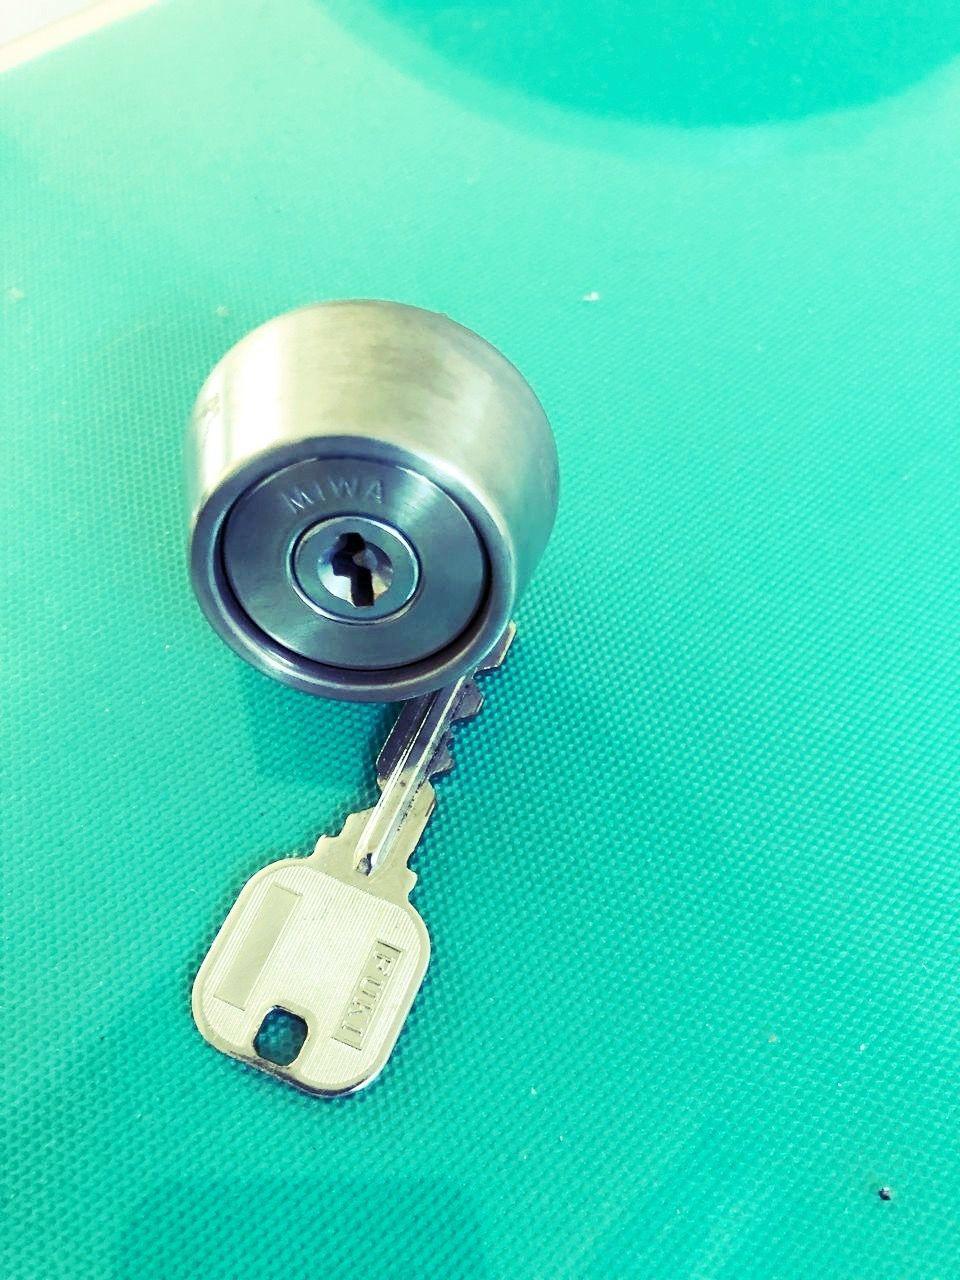 MIWA LSPの鍵交換